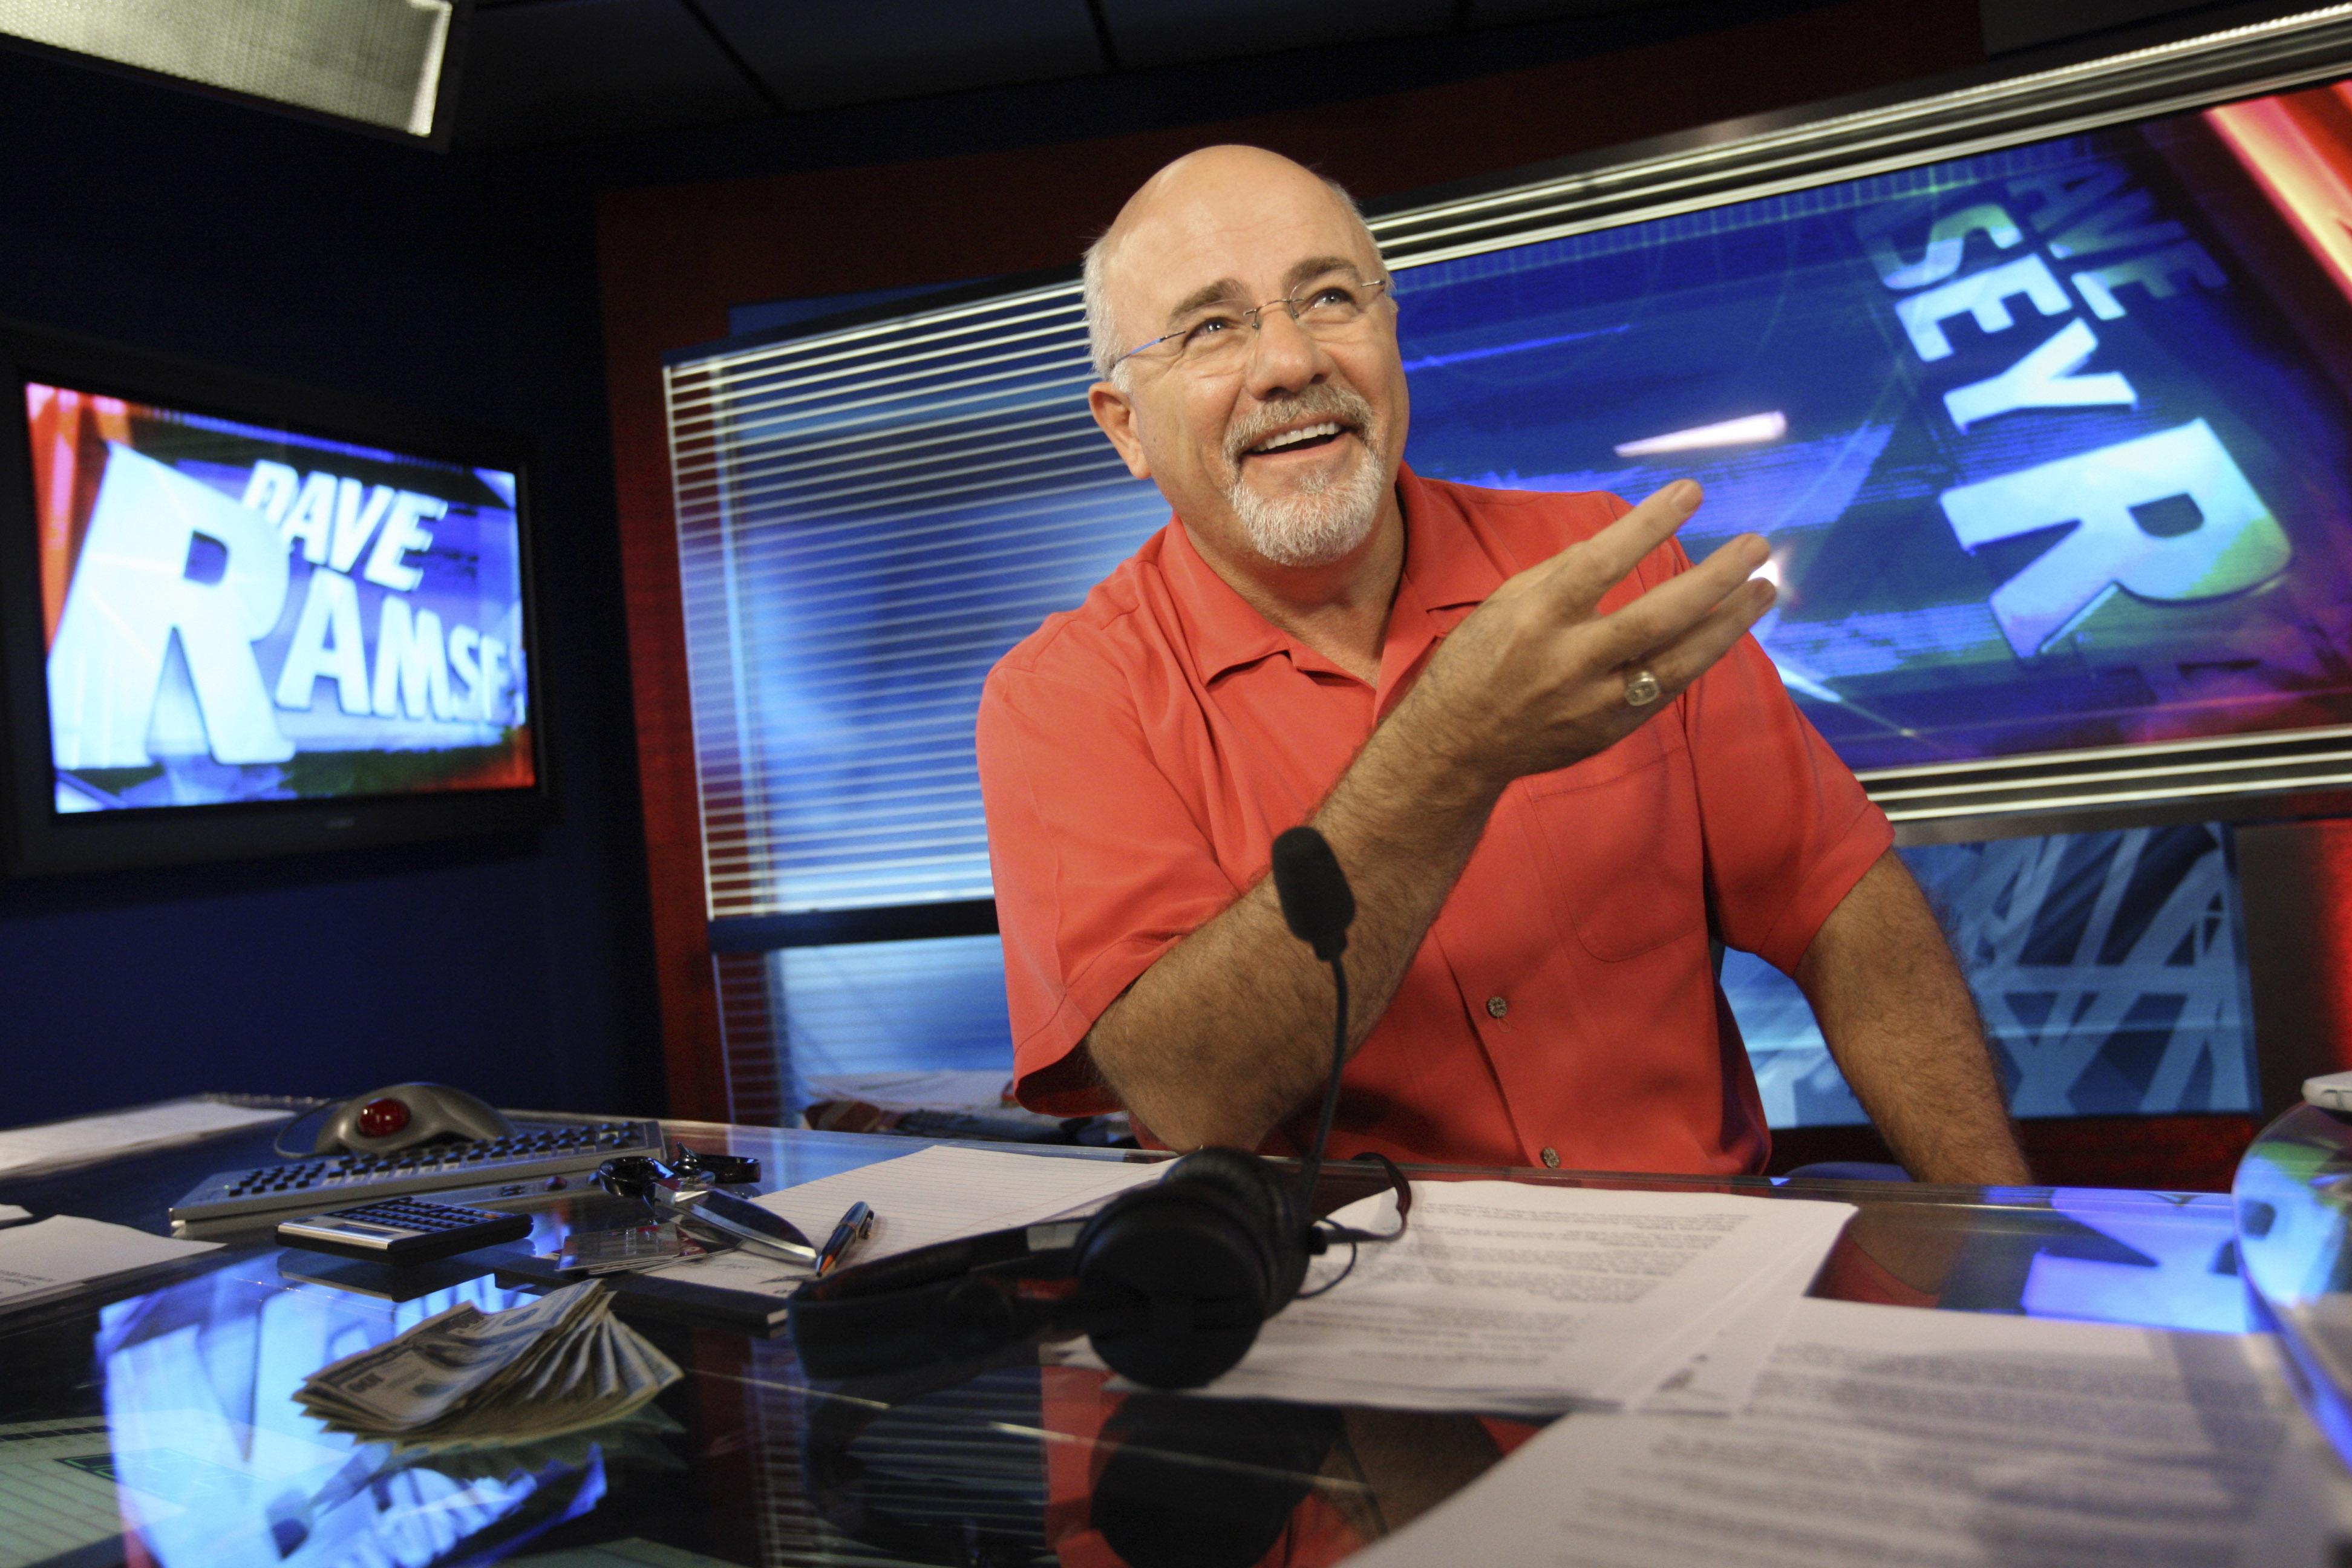 Dave ramsey endorsed car dealer - Dave Ramsey Endorsed Car Dealer 9